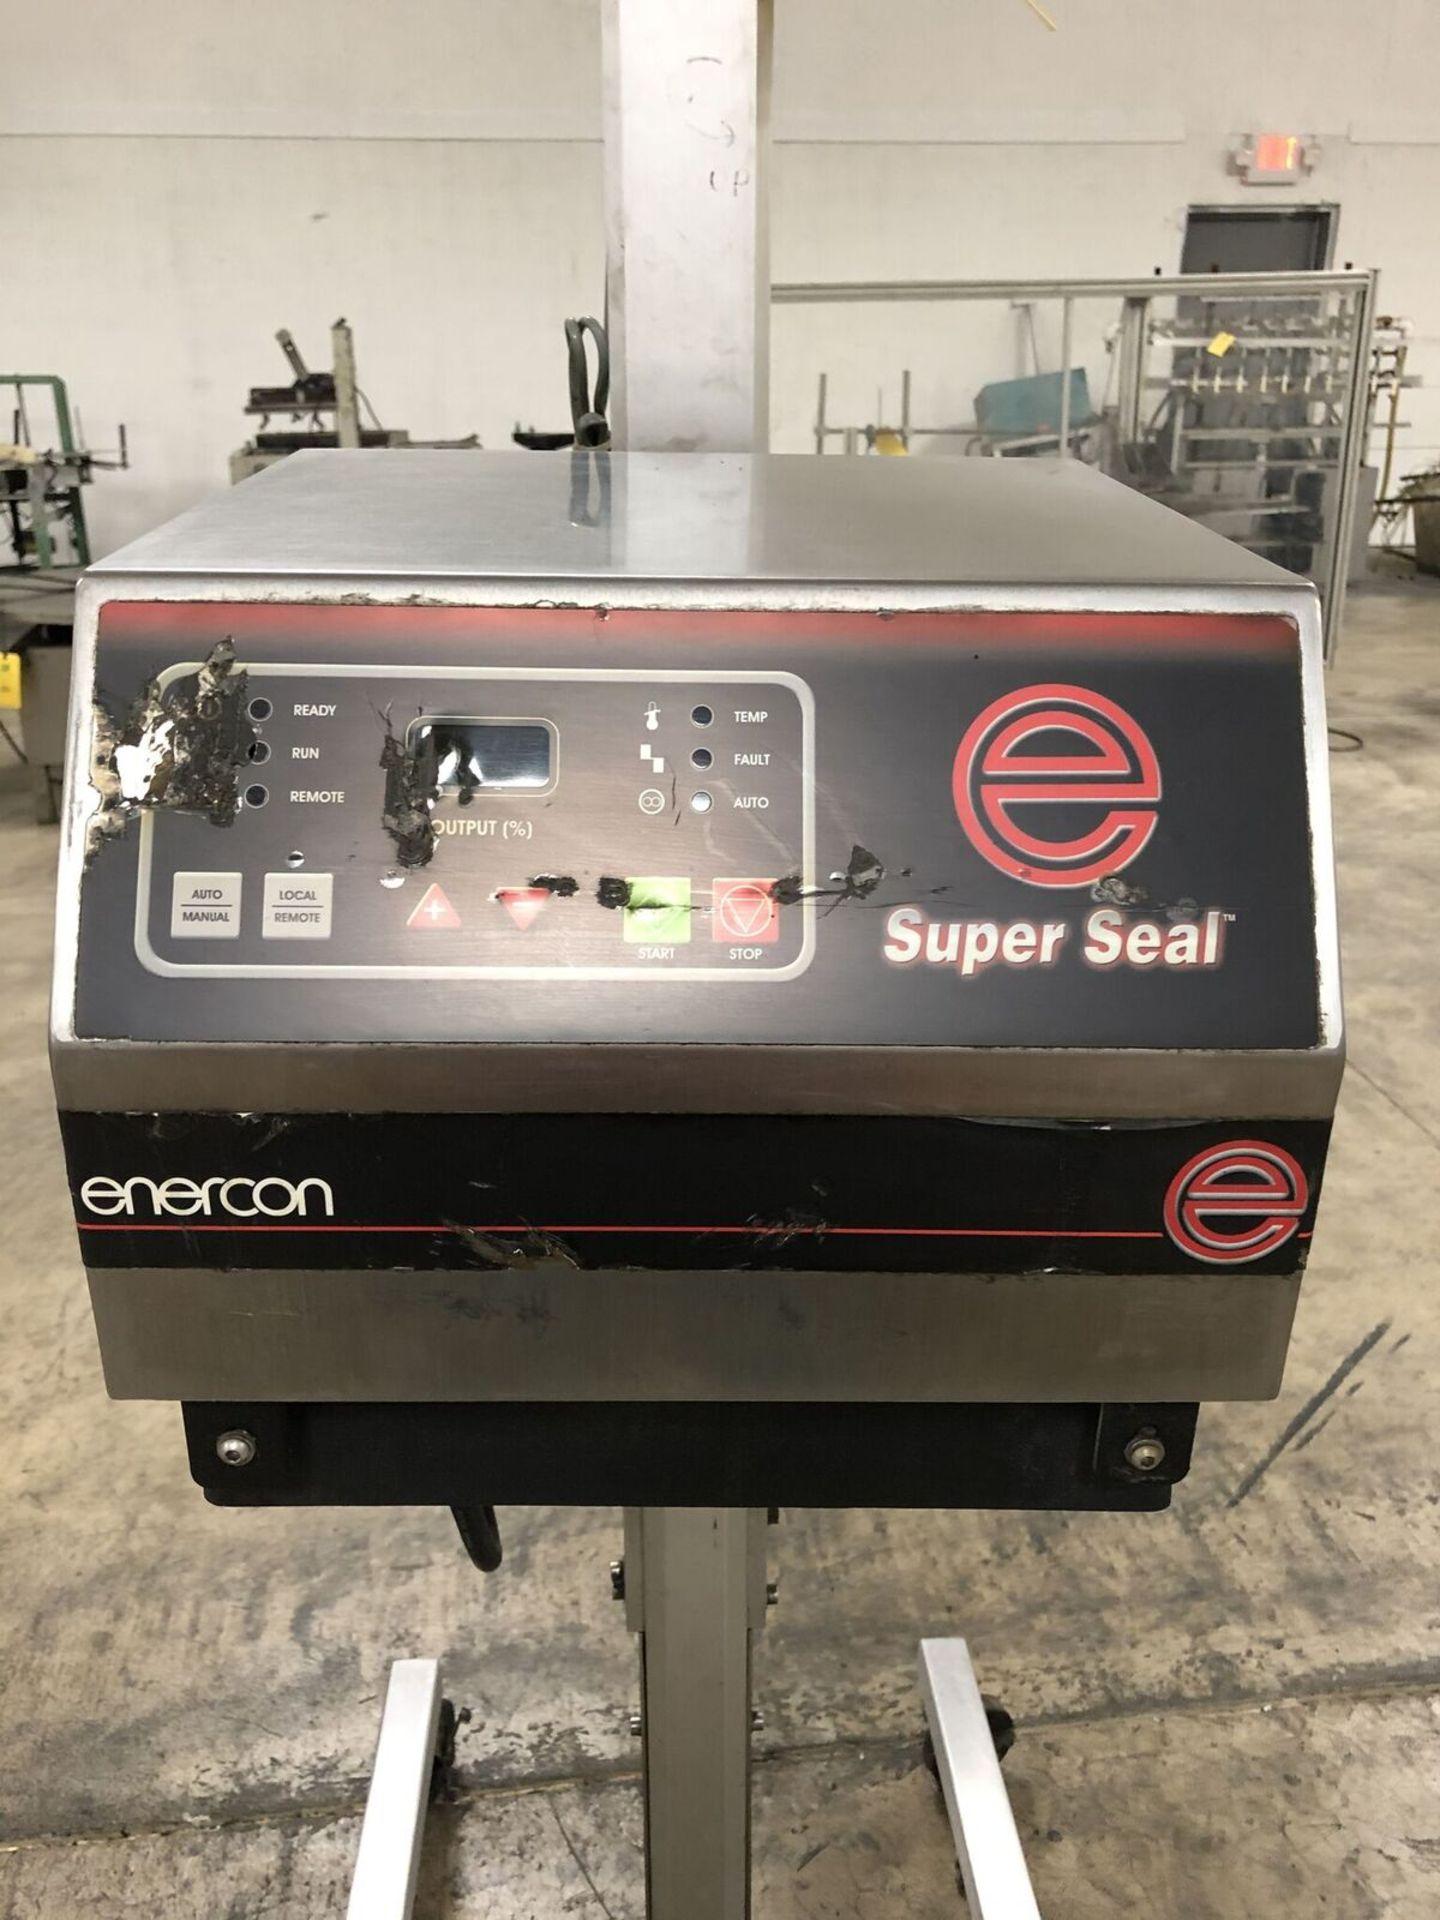 Lot 49 - Enercon Super Seal 75, Model #LM5022-16, S/N #C22628-01